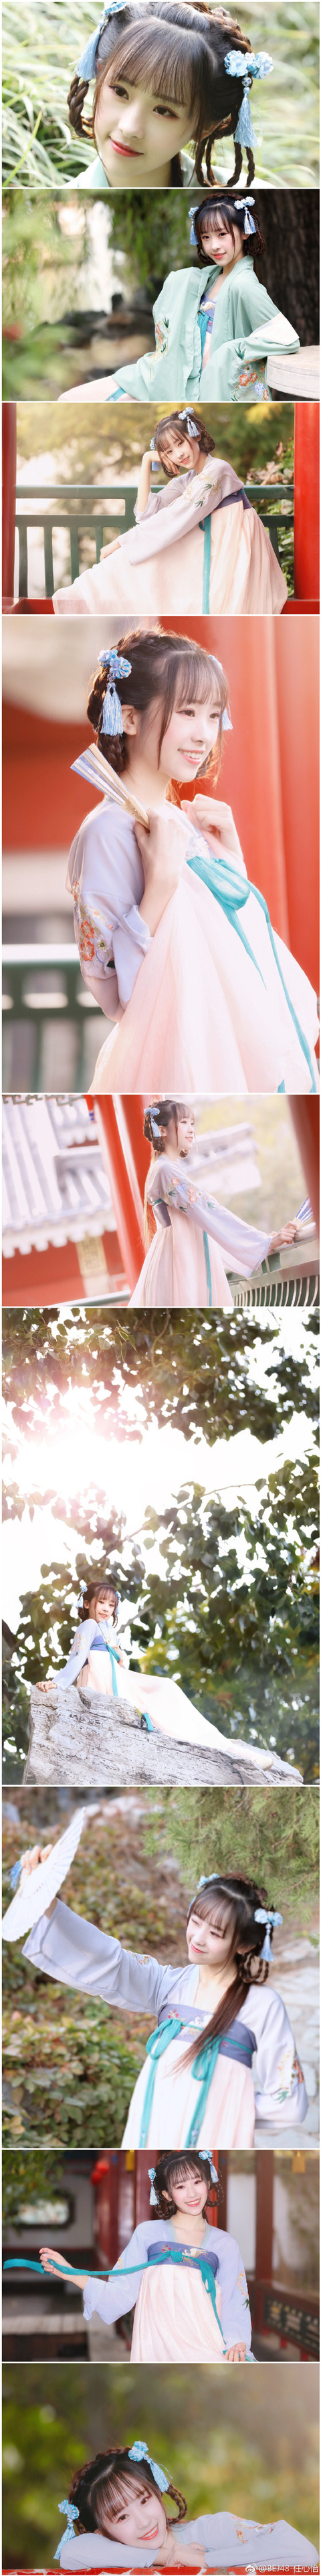 BEJ48任心怡weibo171019